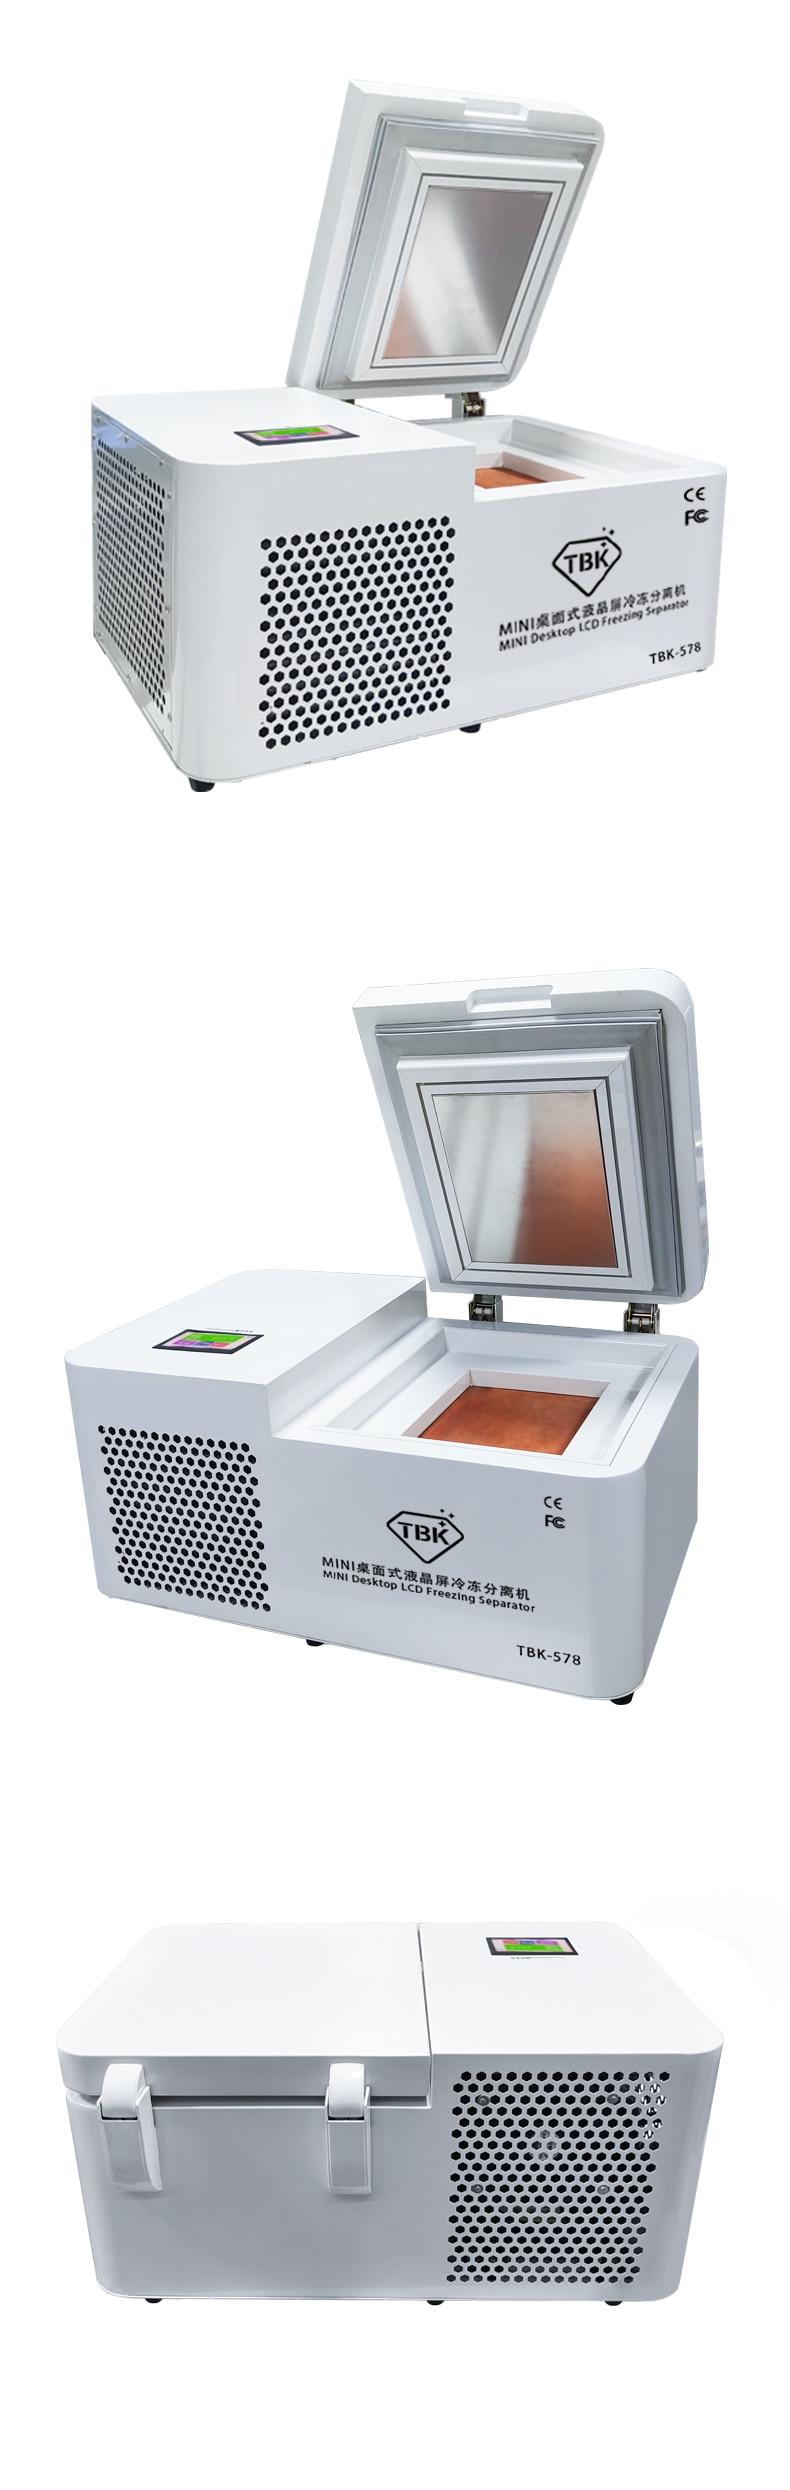 TBK-578 Frozen Separating Machine For Smartphone LCD Repair 17